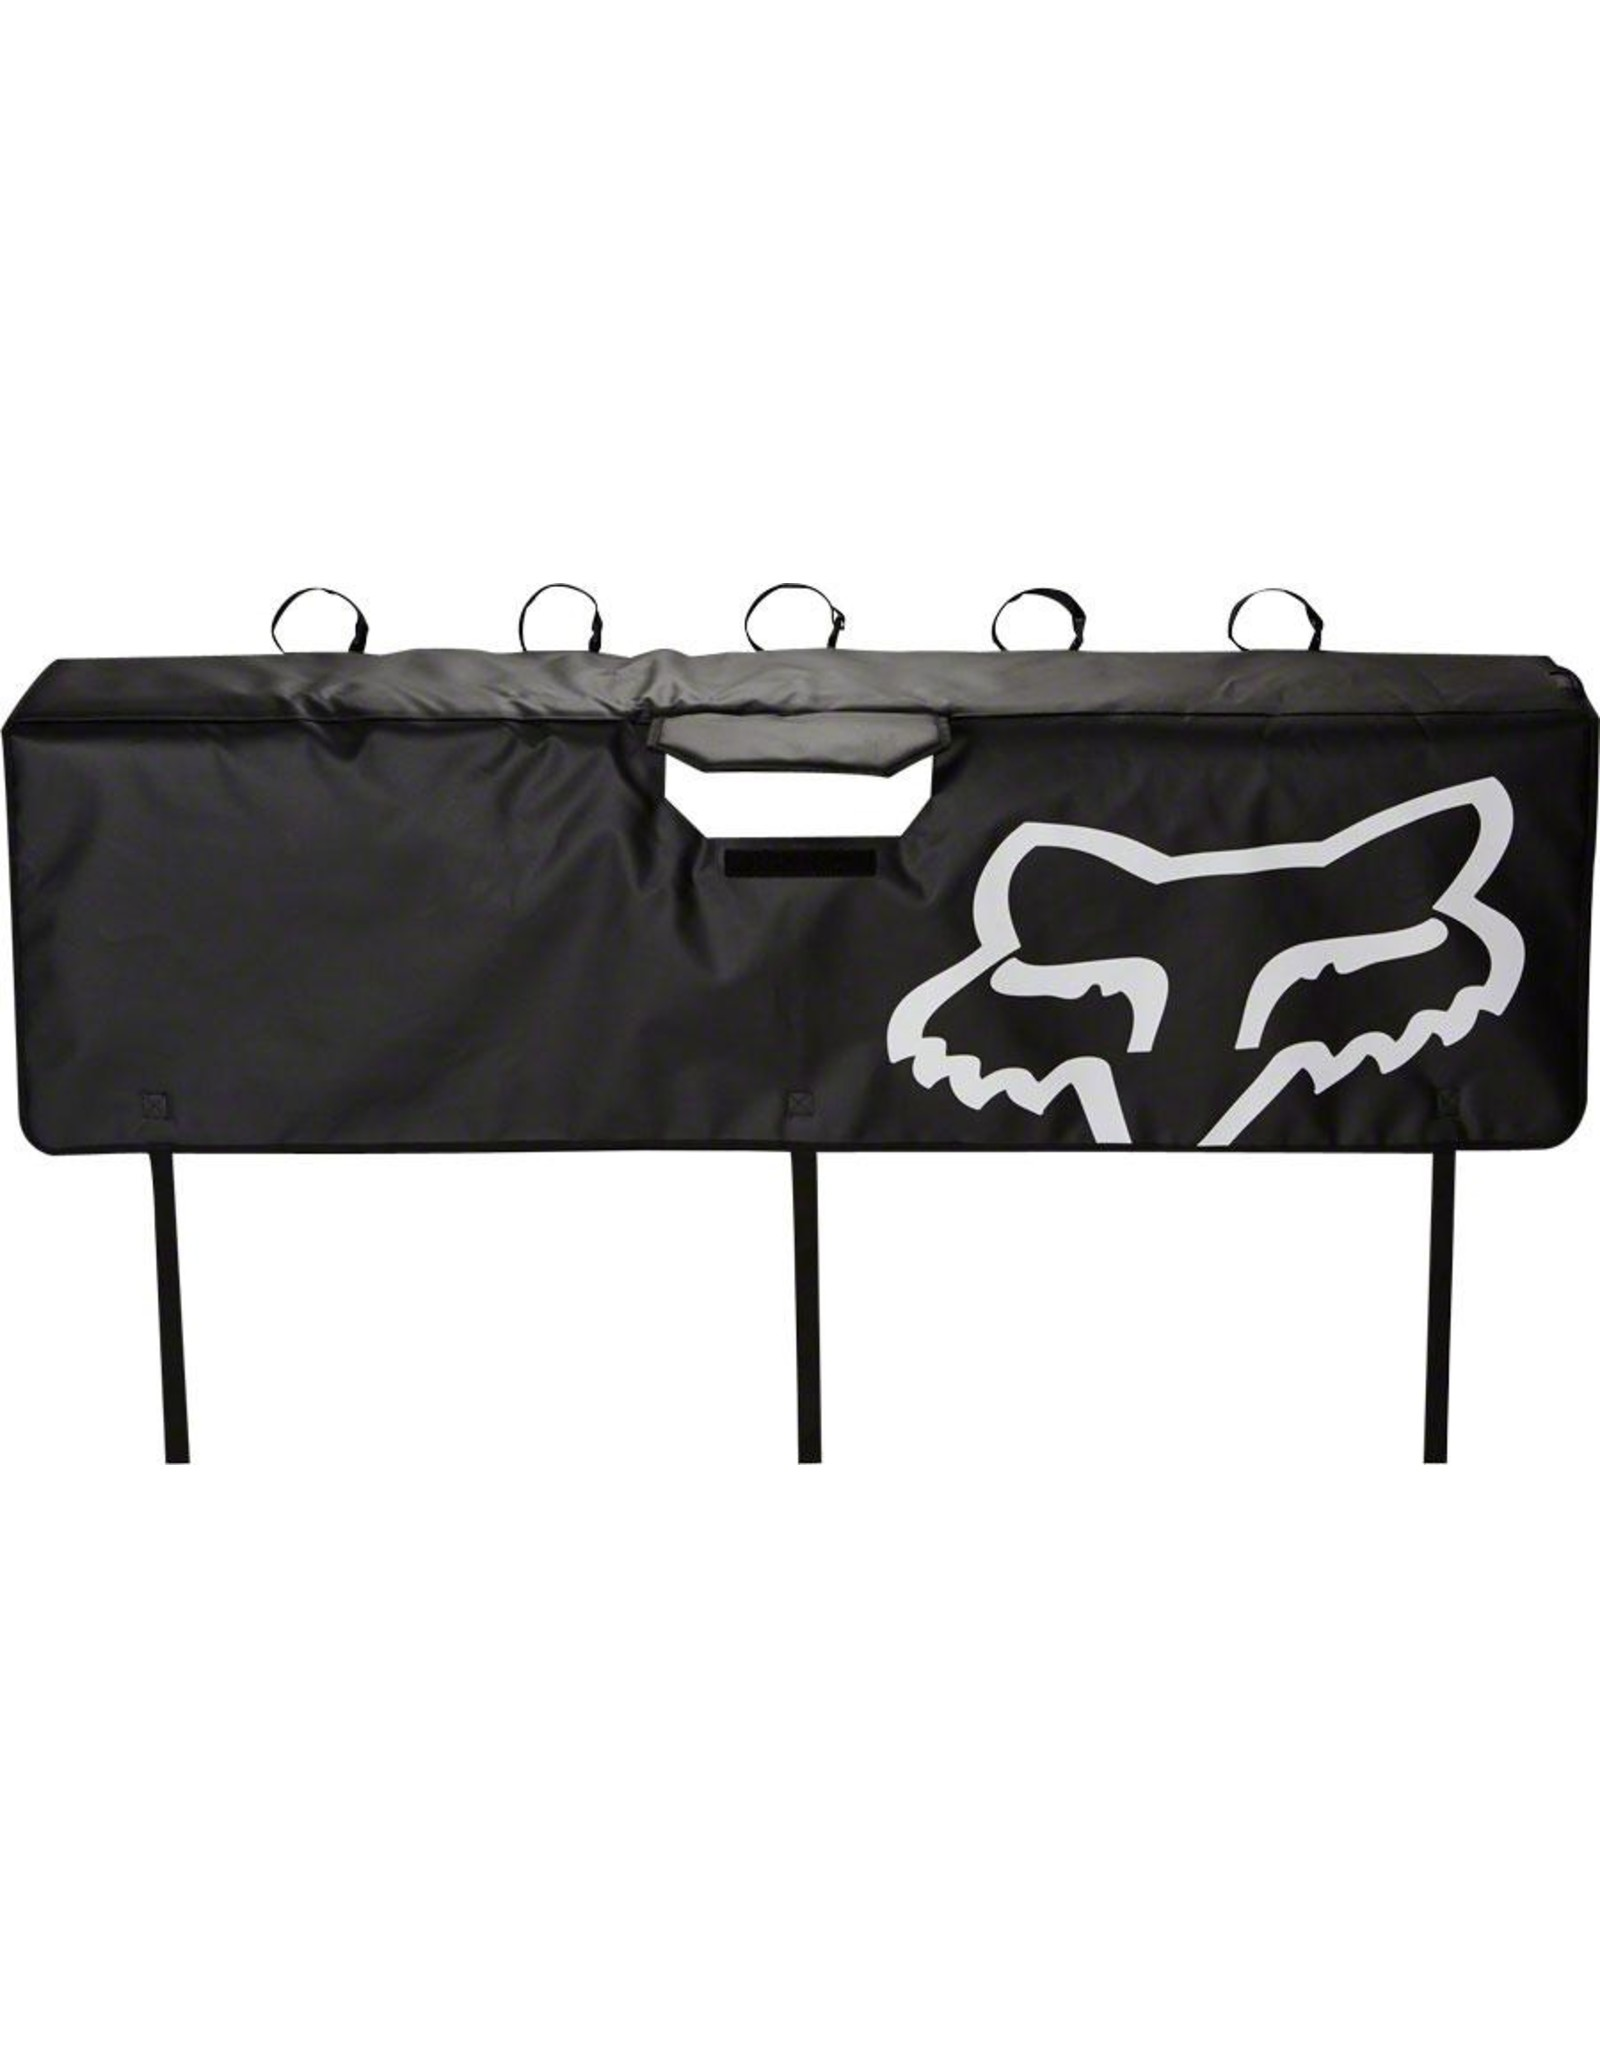 Fox Racing Fox Racing Tailgate Cover: Black Large